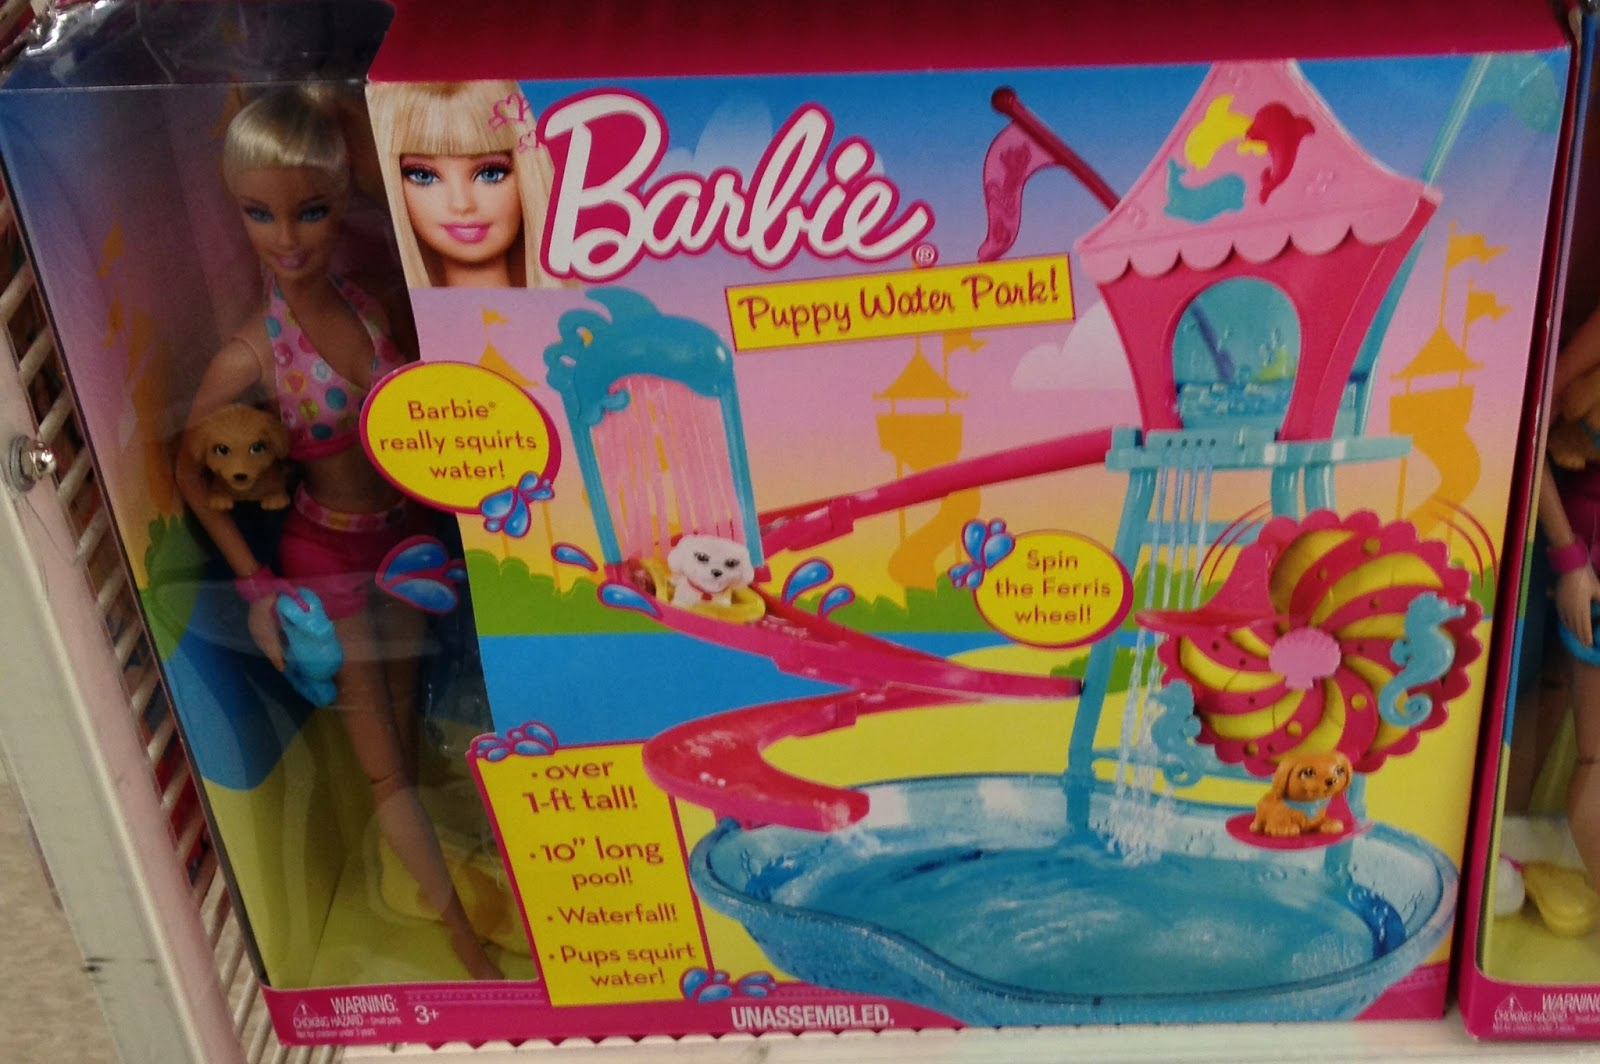 Barbie squirt